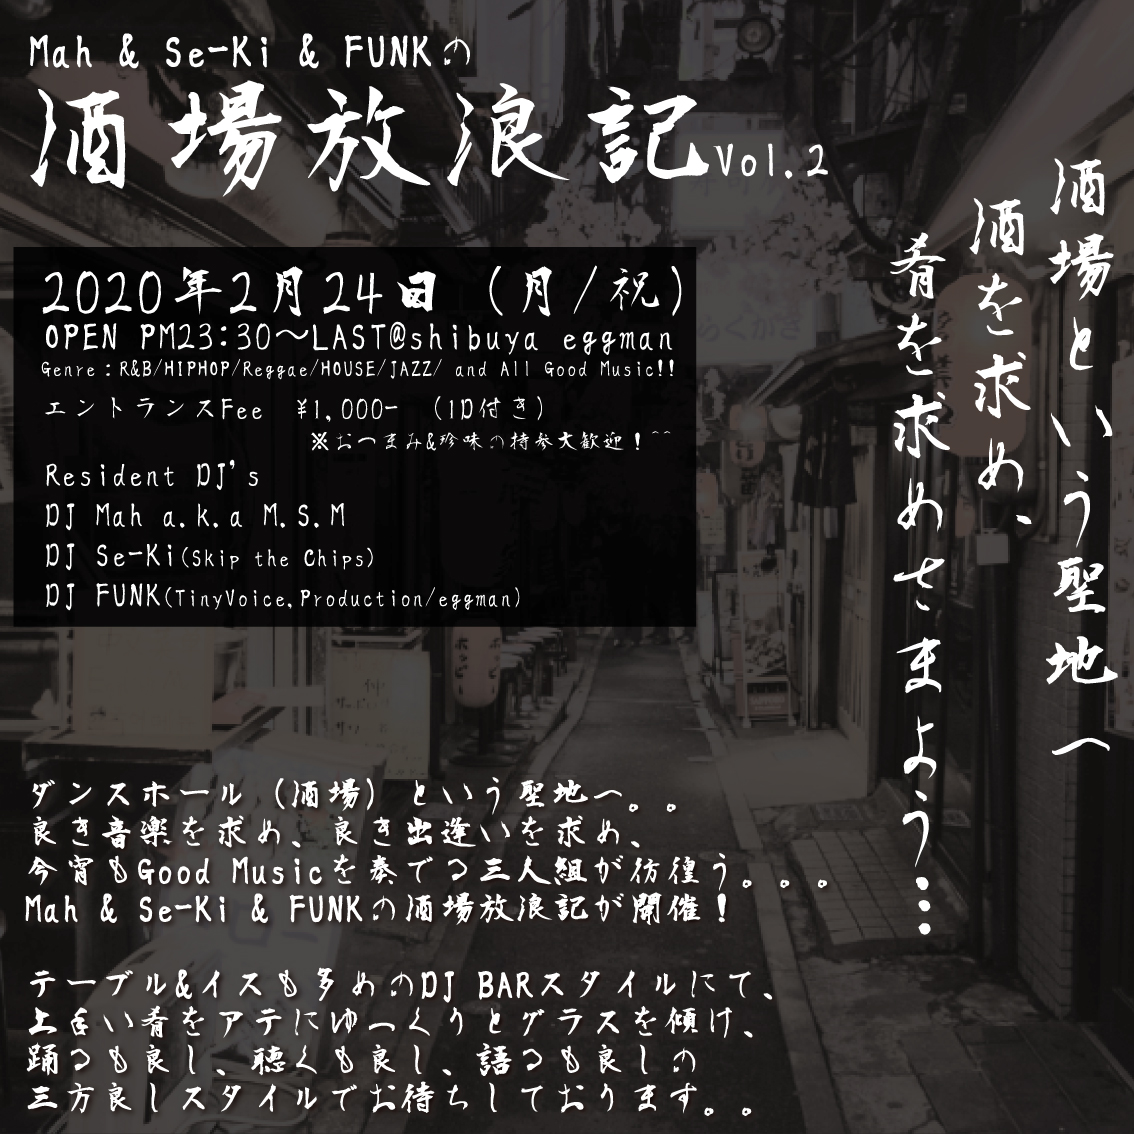 Mah & Se-Ki & FUNKの酒場放浪記 Vol.2